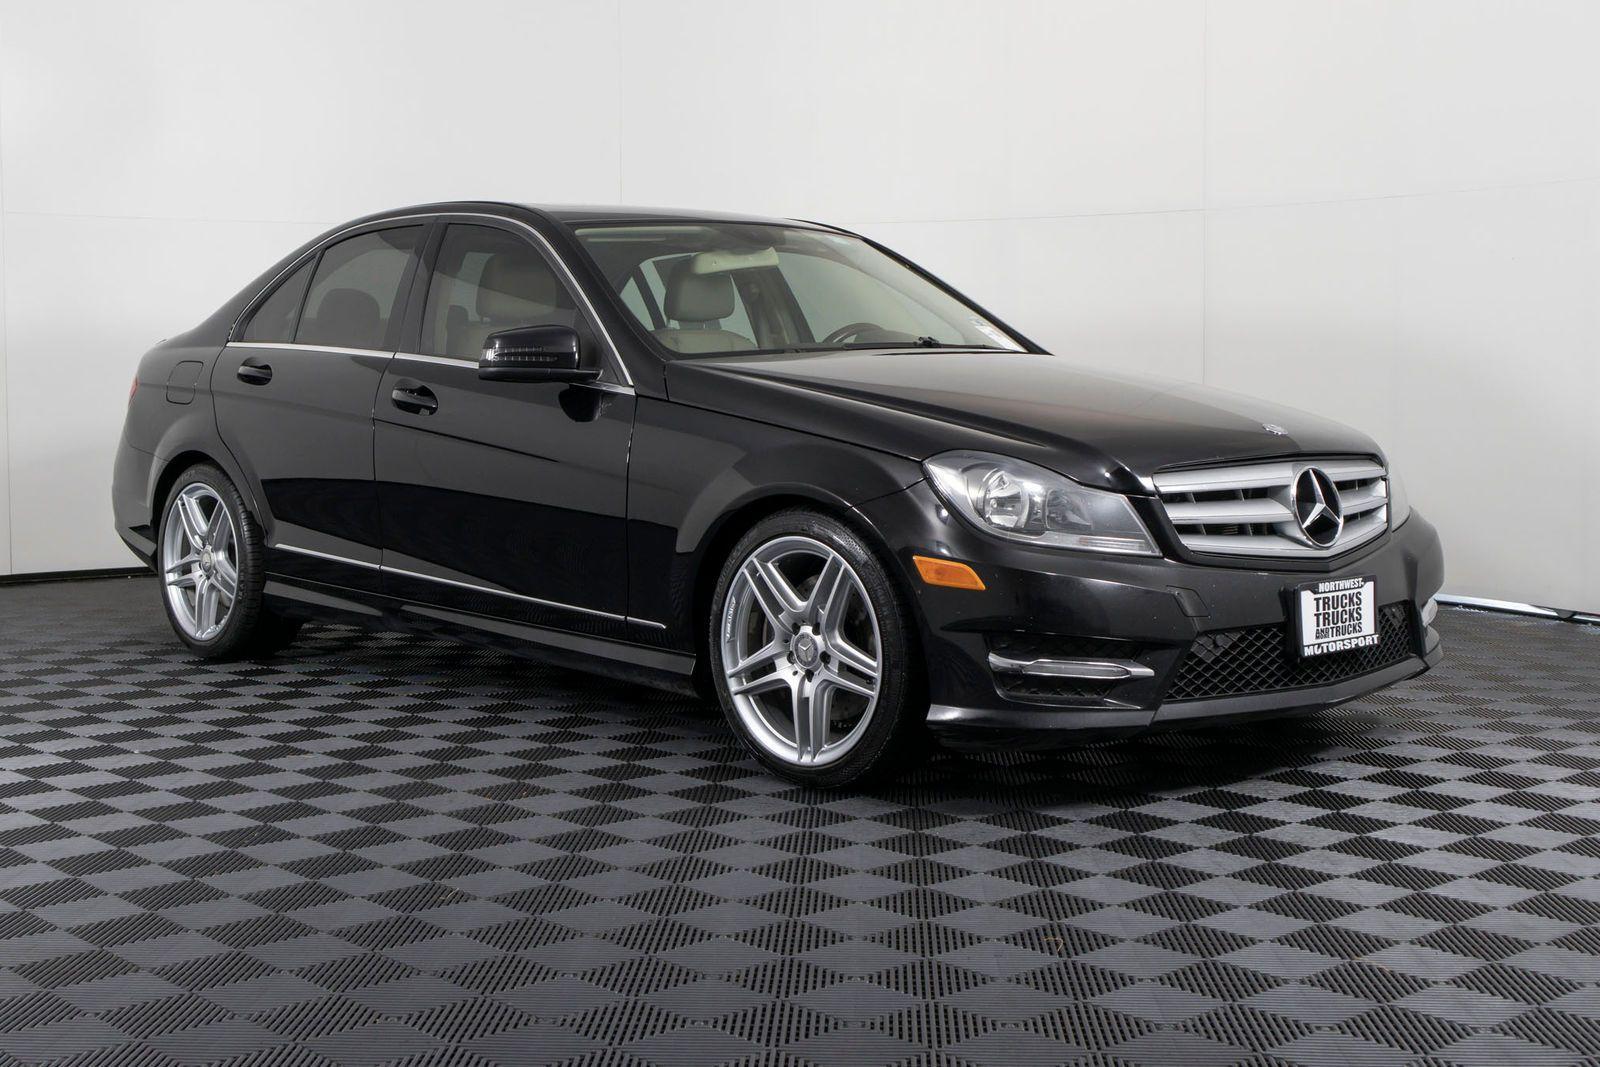 Used 2013 Mercedes Benz C300 4matic Awd Sedan For Sale Northwest